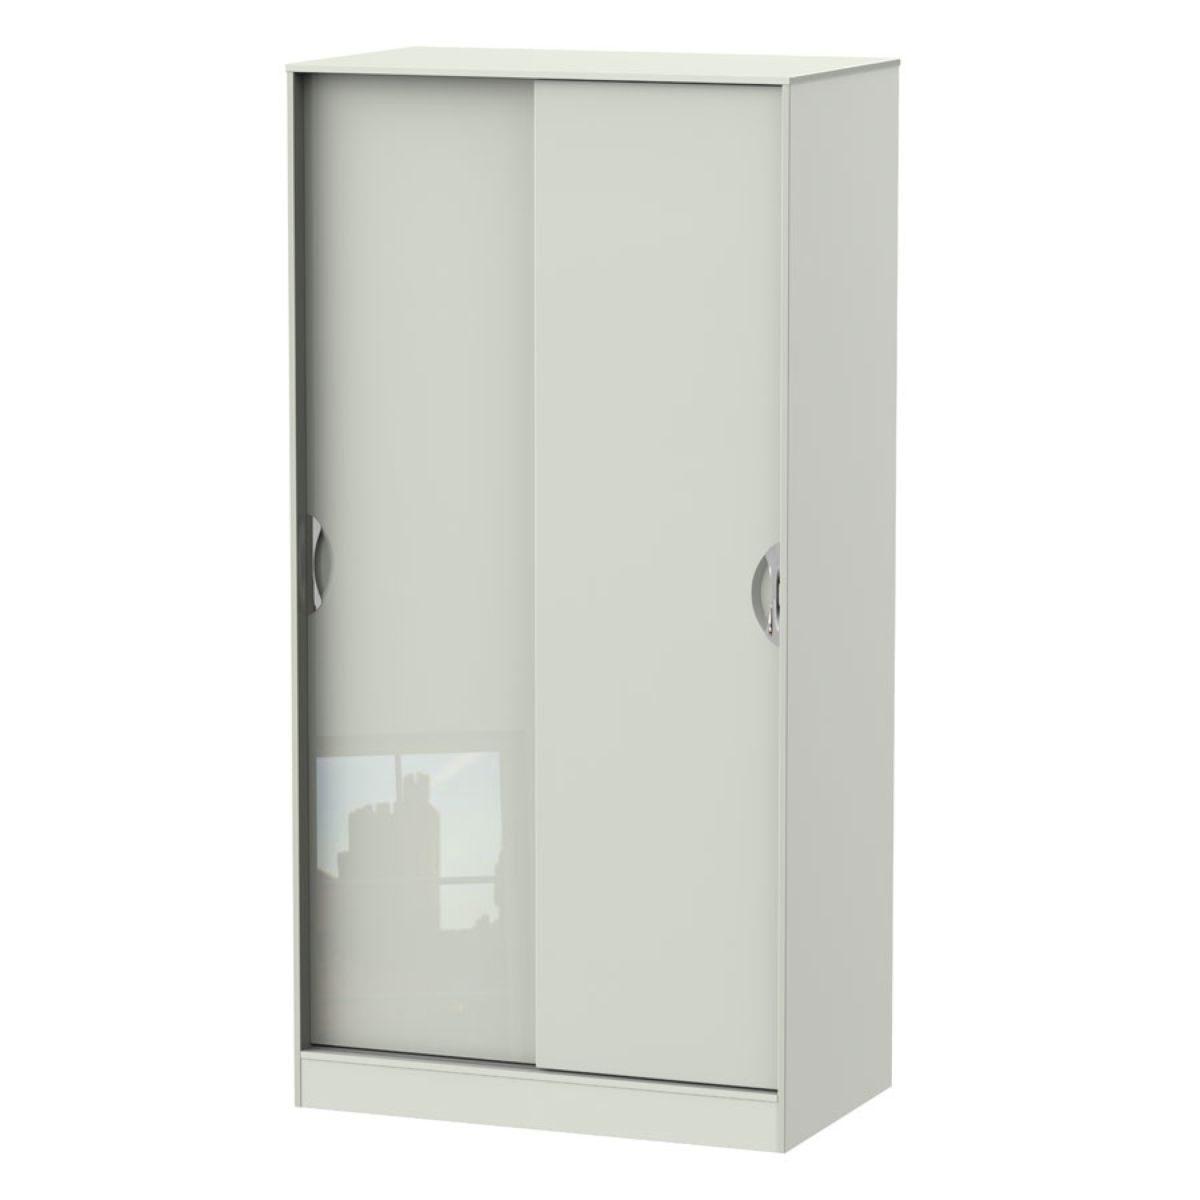 Indices Sliding Door Wardrobe - White/Grey